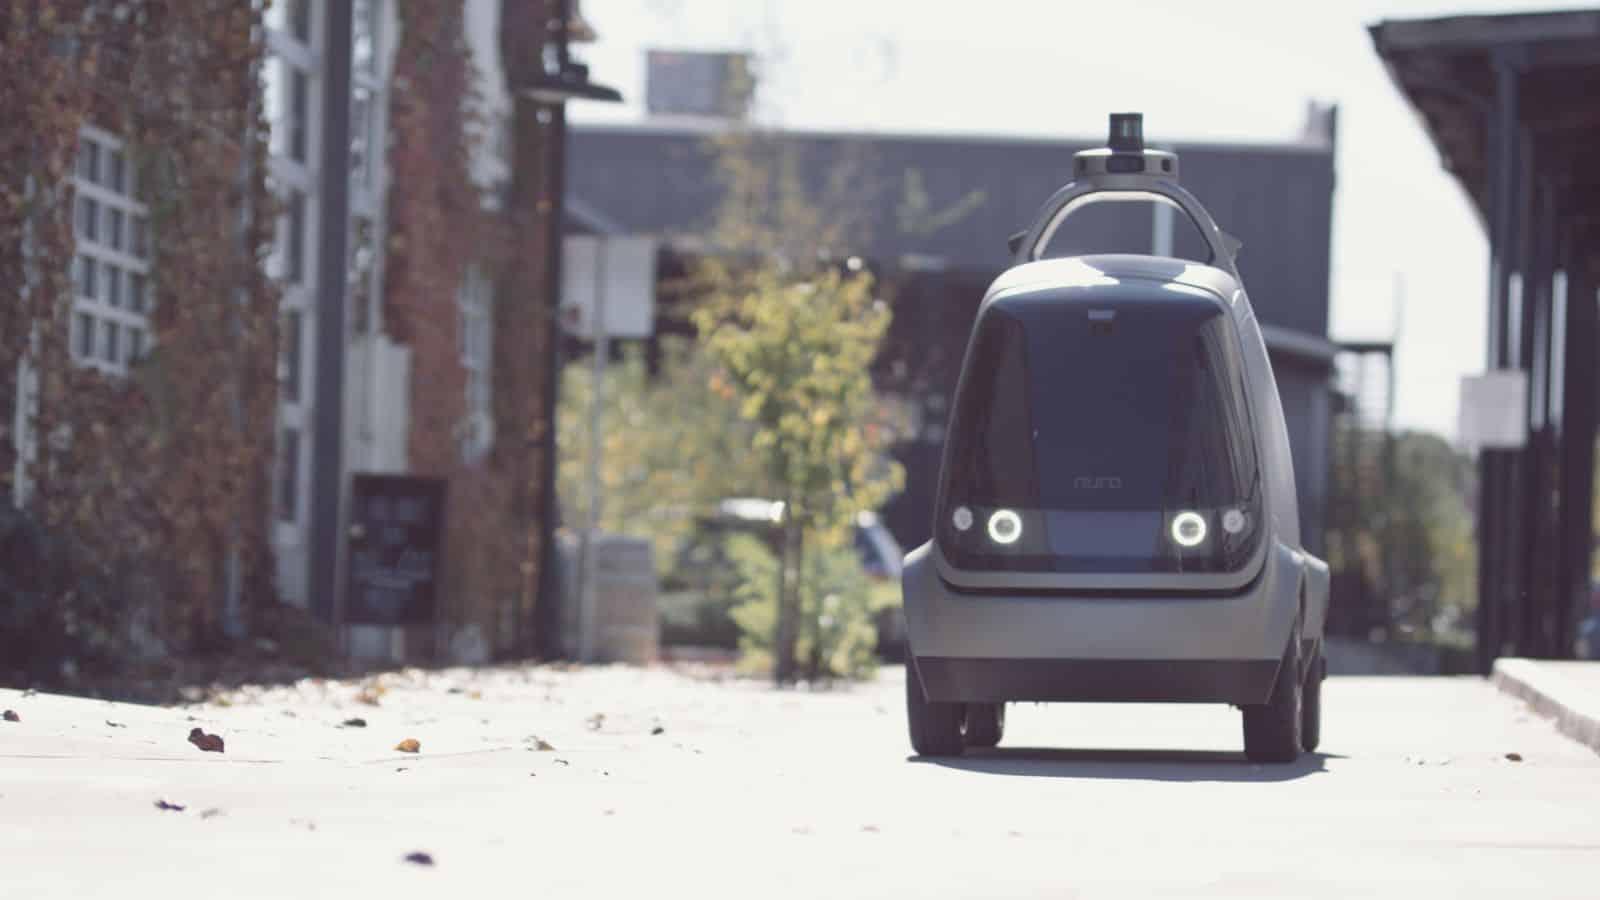 TechGYO_Nuro's Robotic Delivery Vans over Self Driven Cars